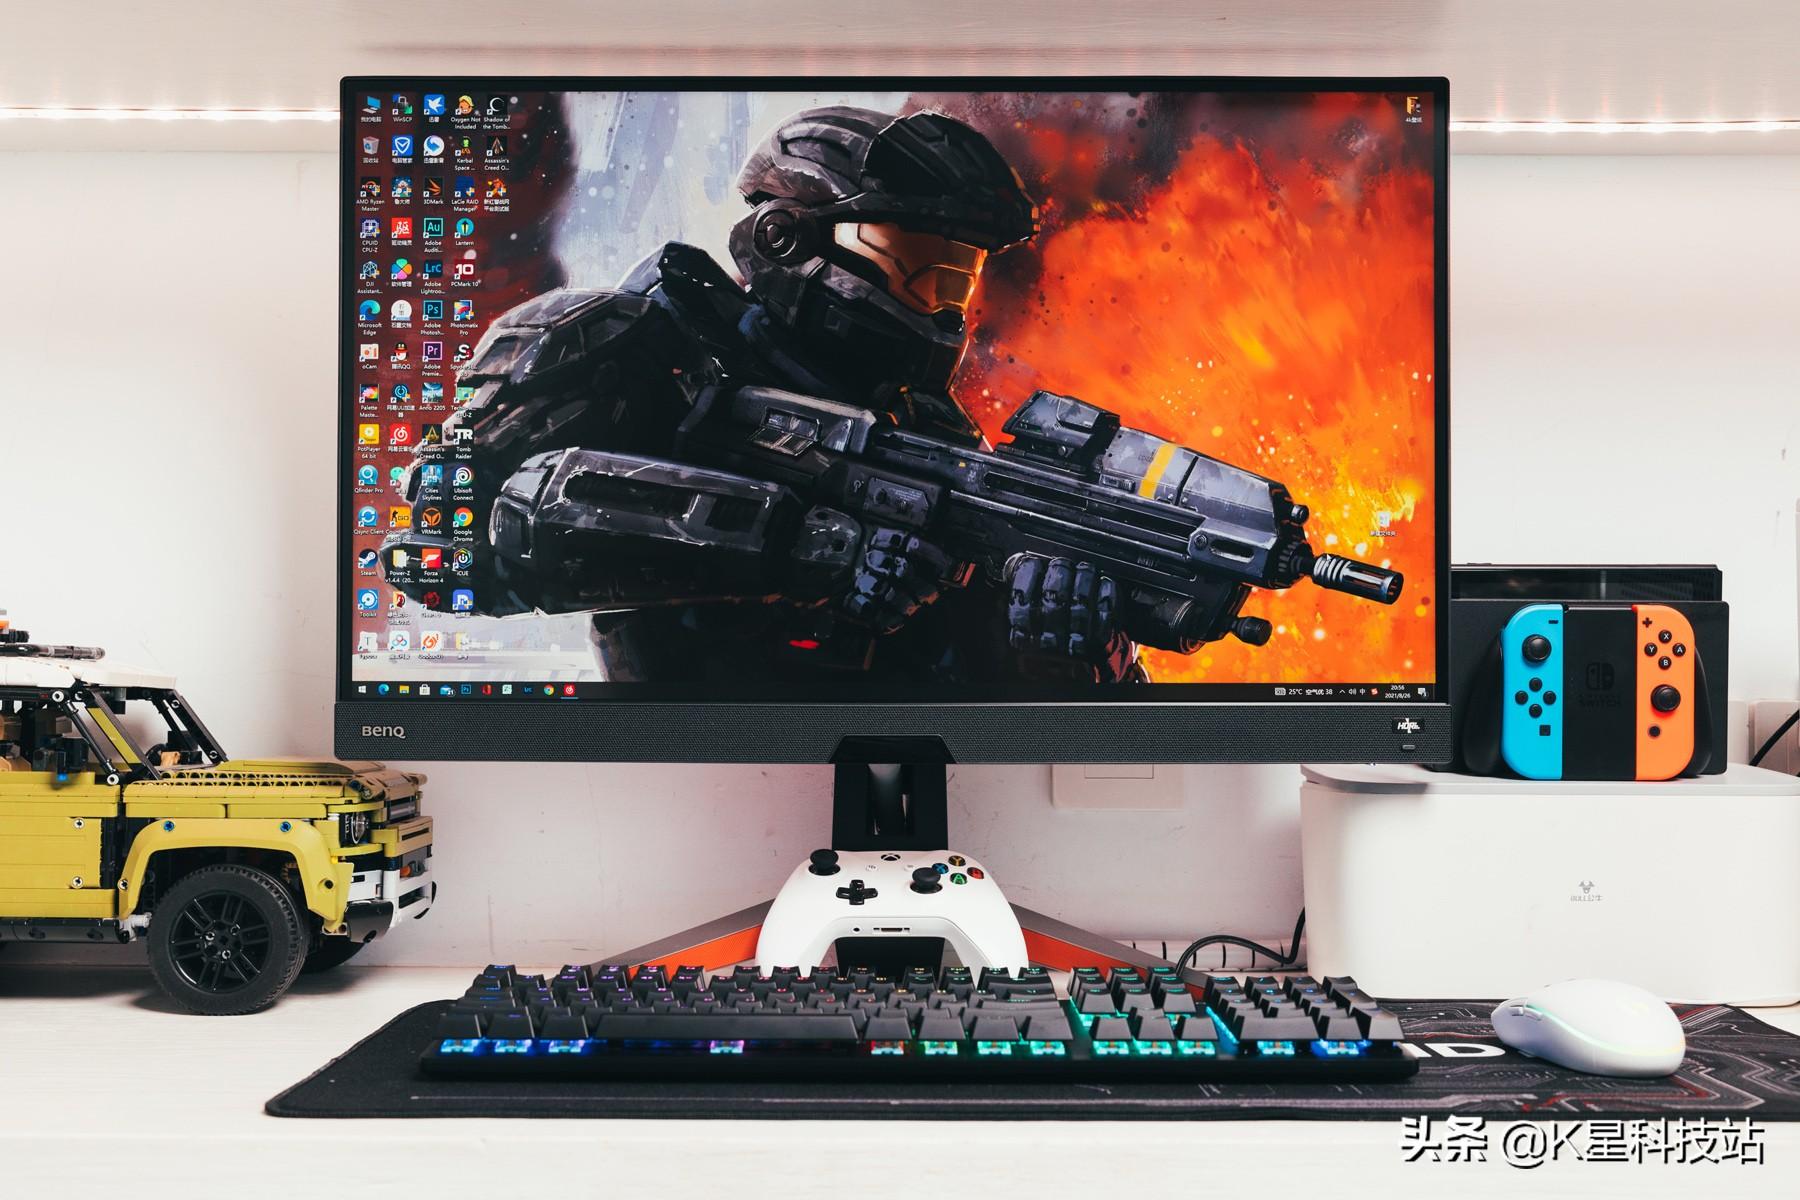 2K分辨率游戏显示器,该如何选择?MOBIUZ EX2710Q显示器深度体验